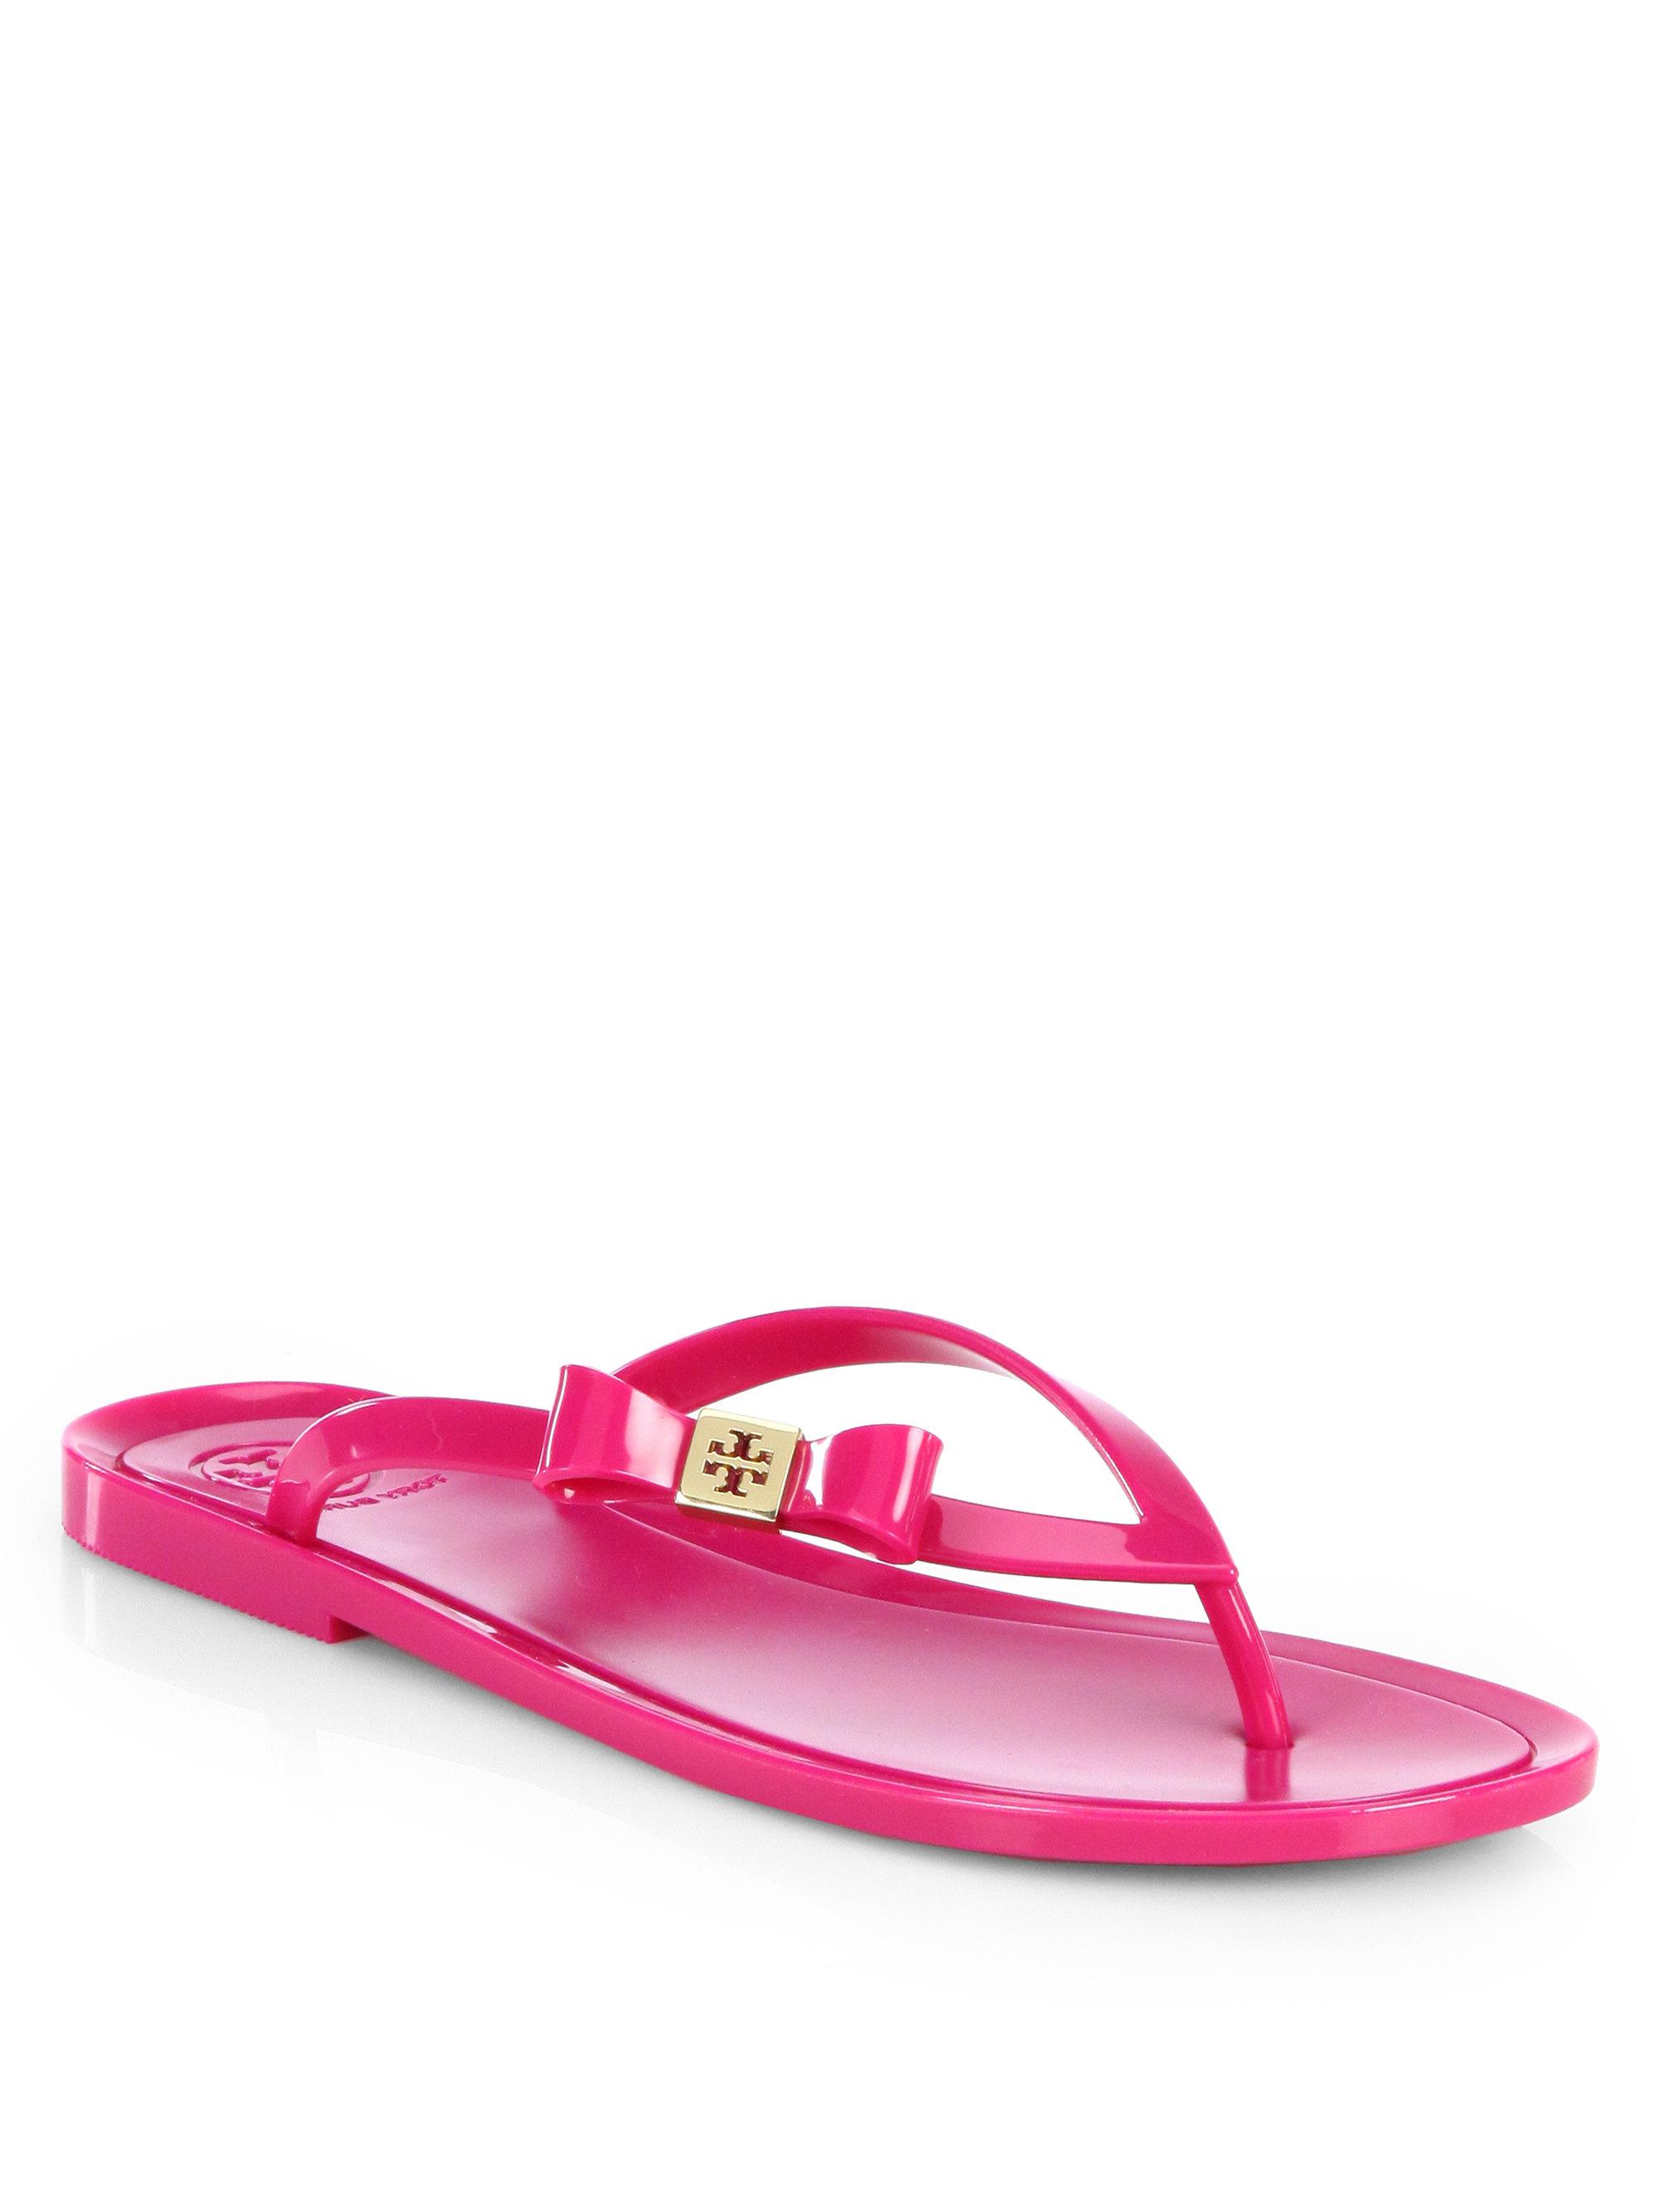 Tory Burch Michaela Jelly Thong Flip Flops In Pink Dark